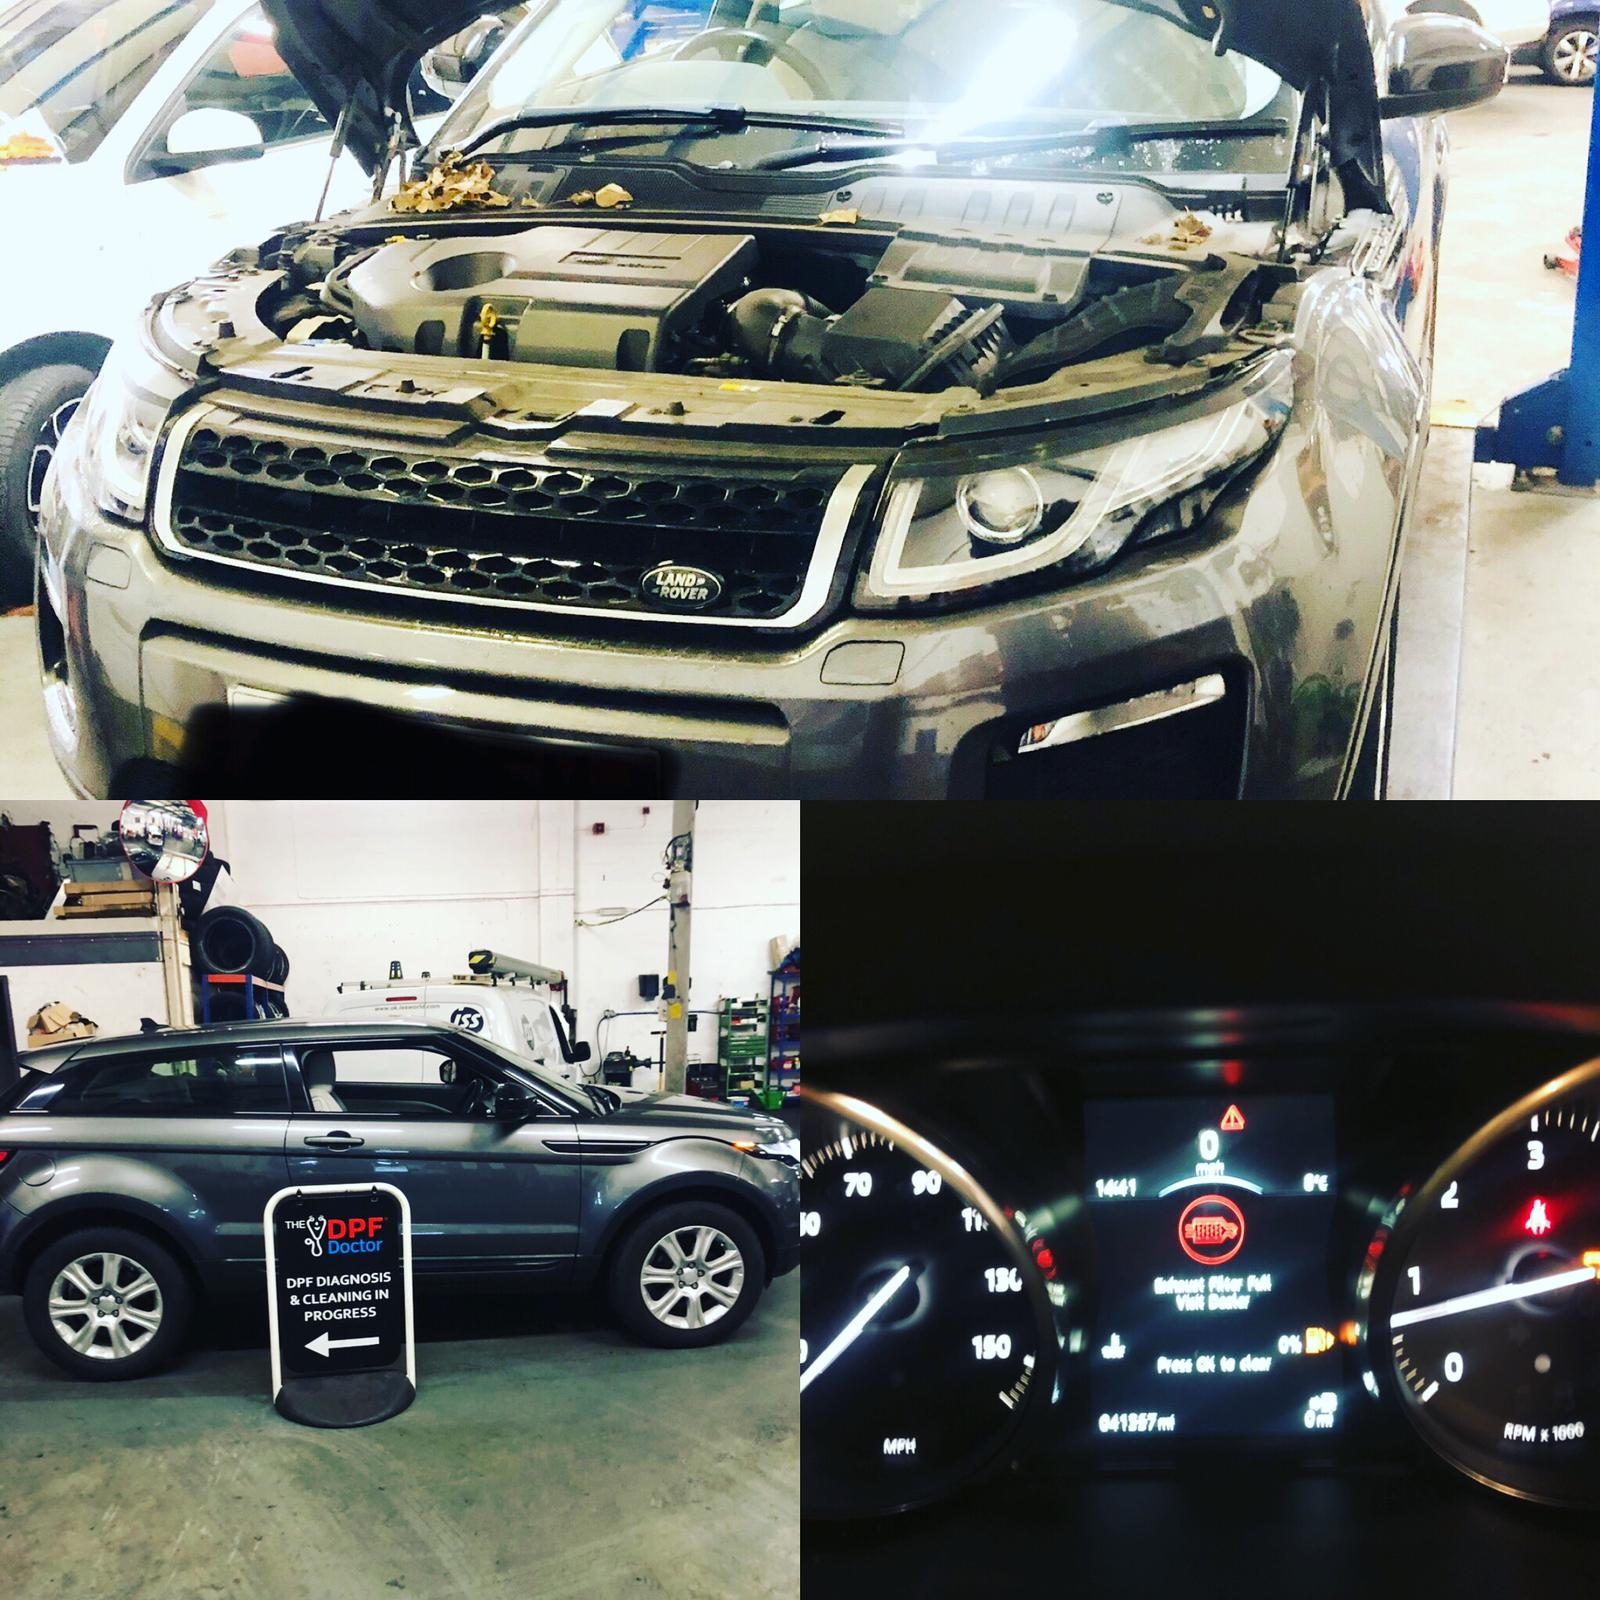 Range Rover Evoque P2463 P246B